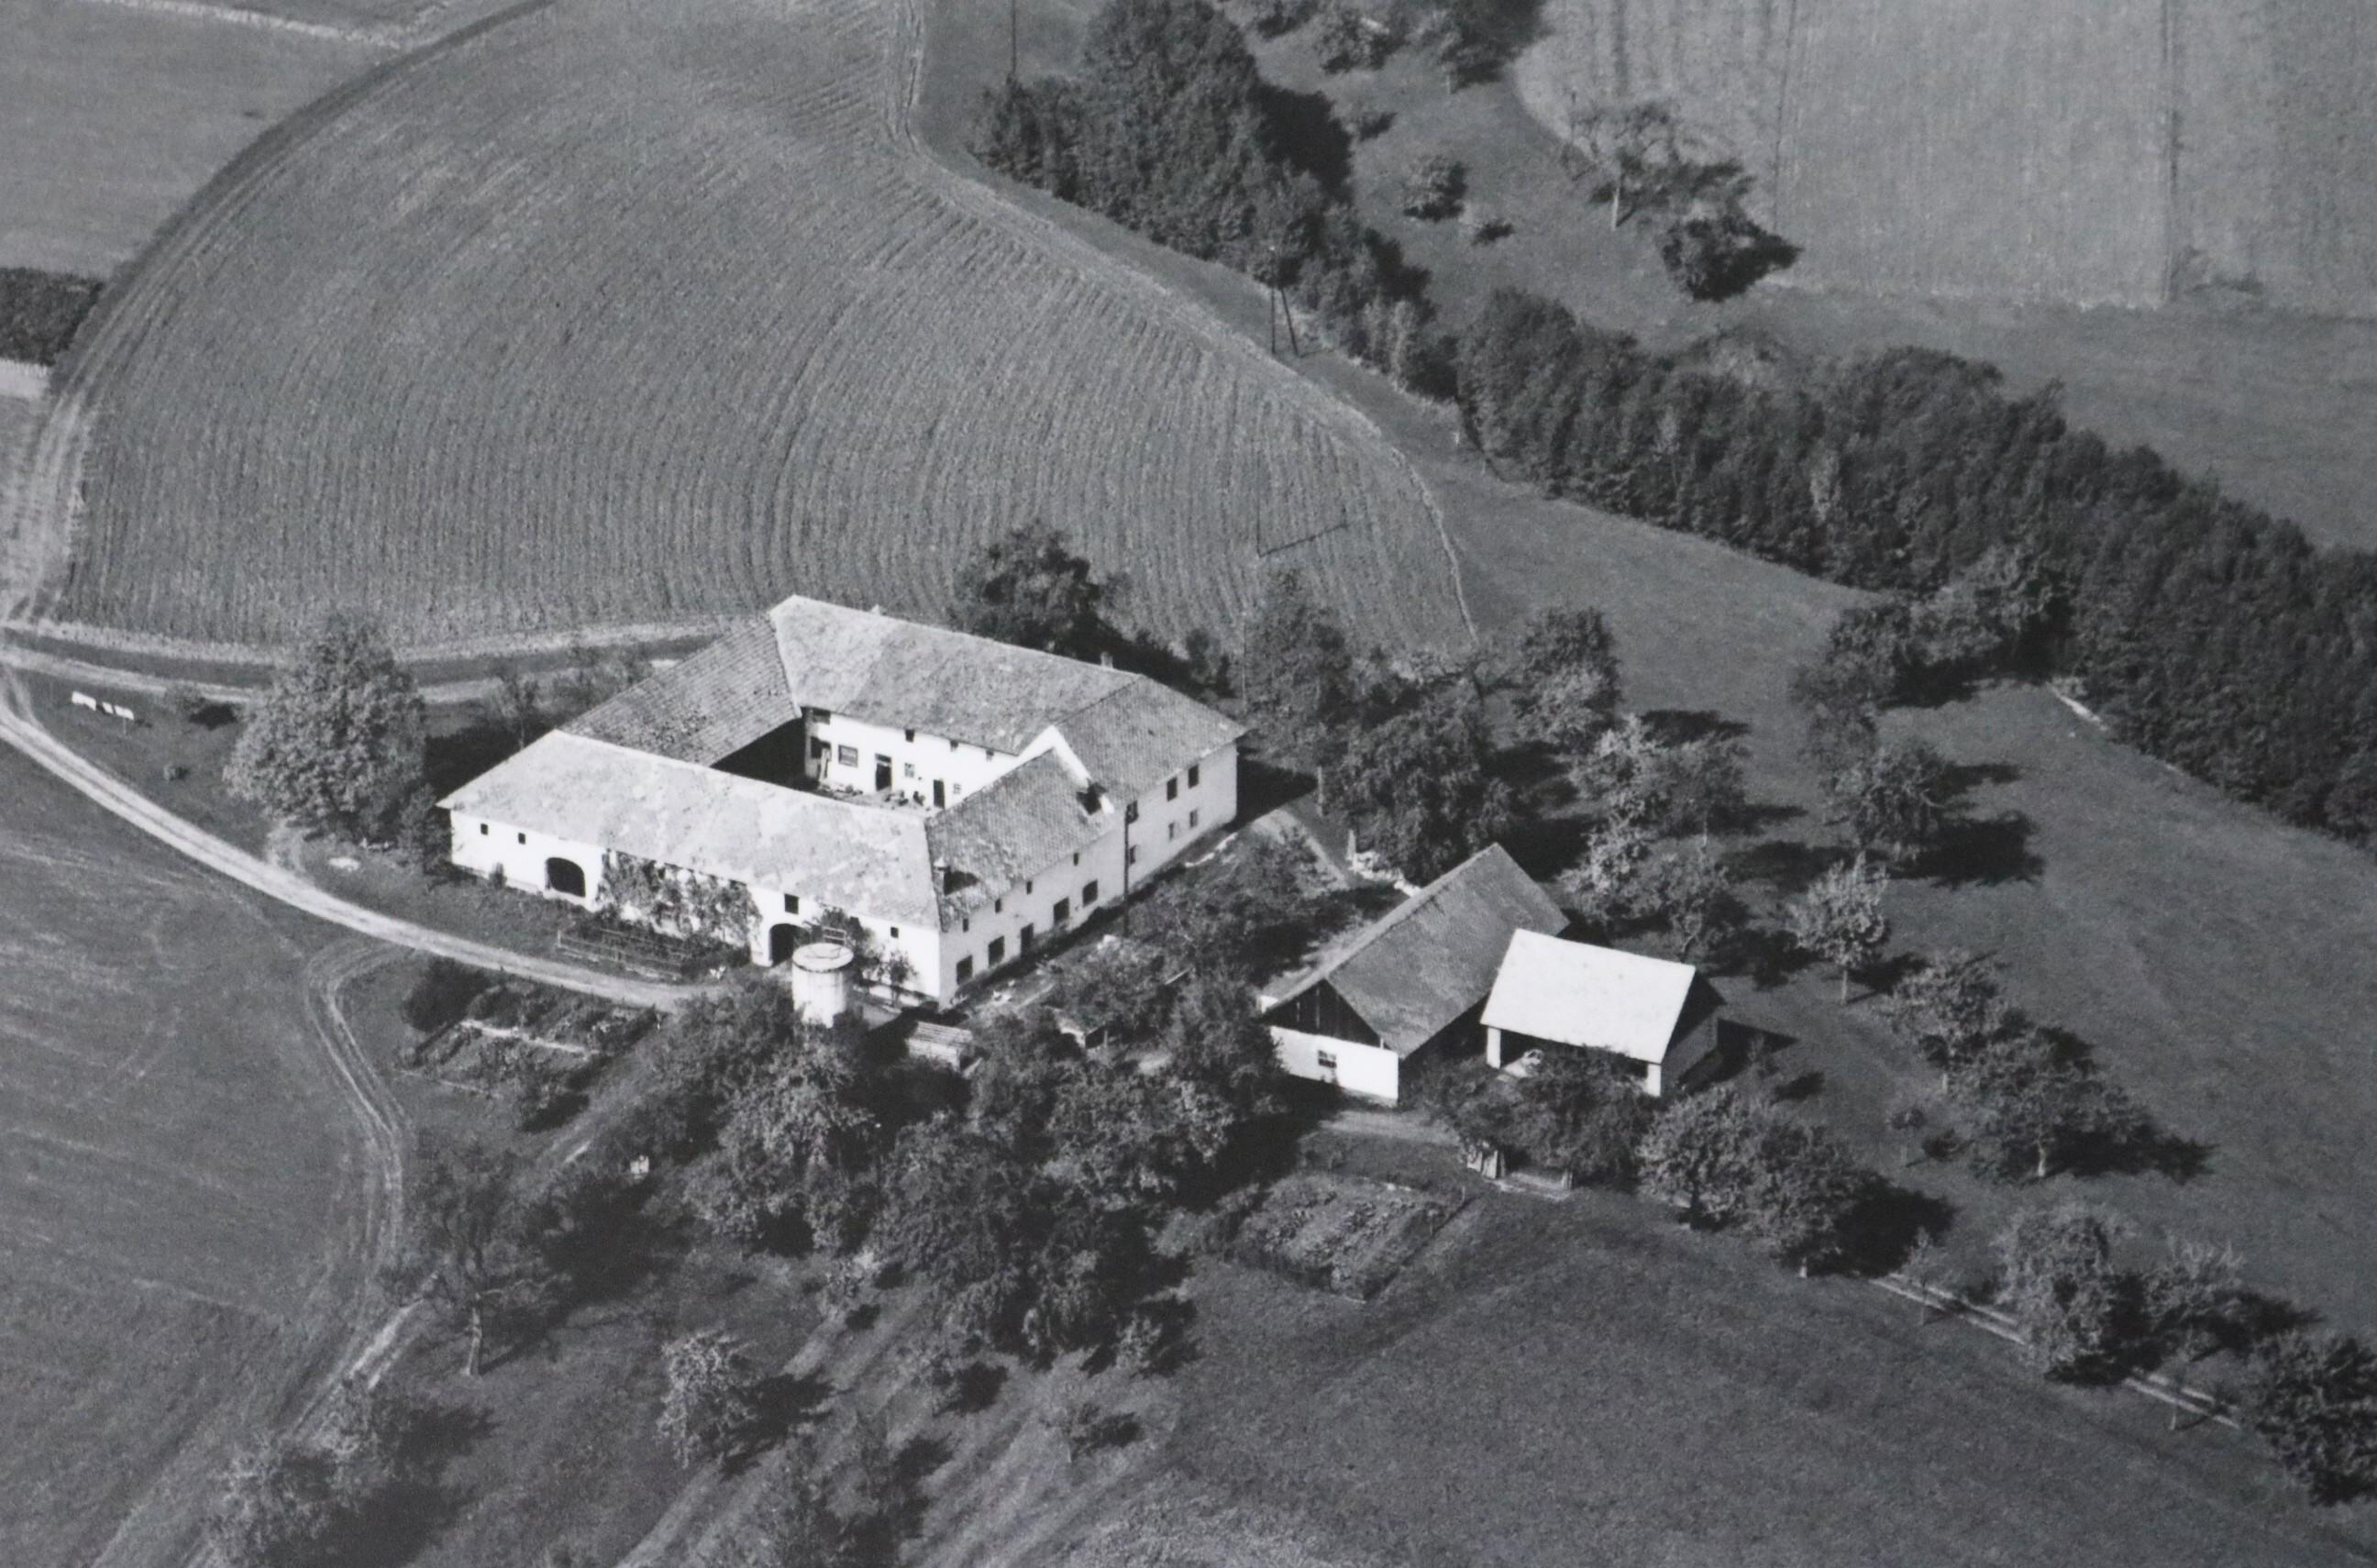 Achatzbergerhof 1971